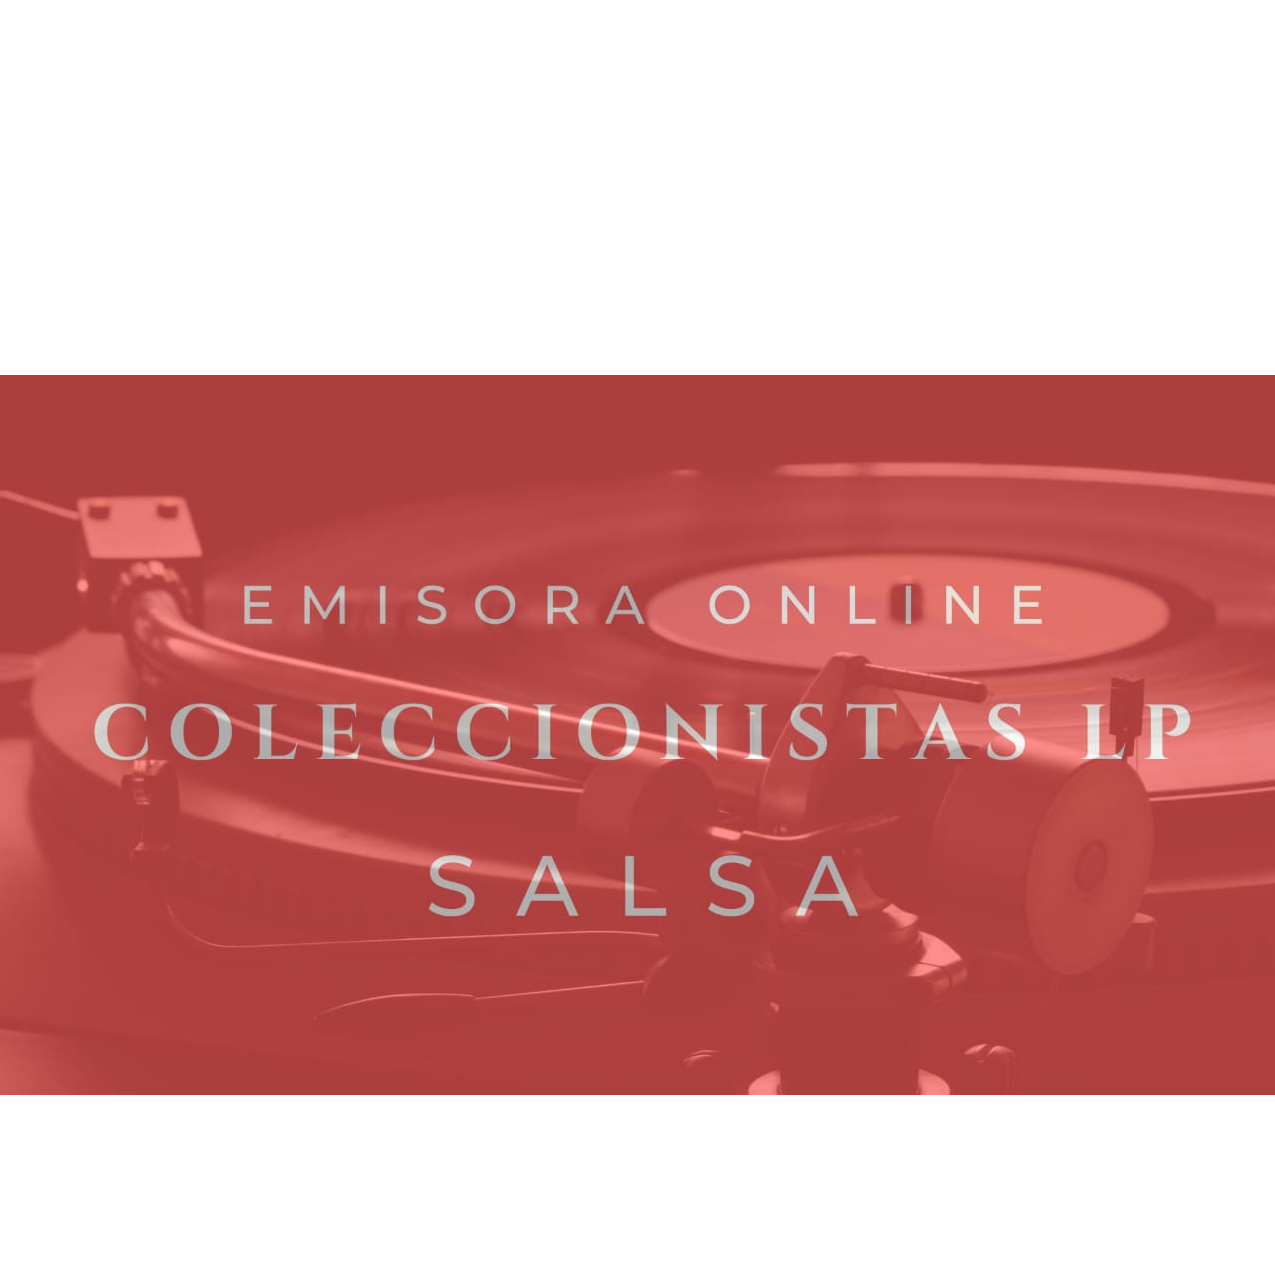 SALSA COLECCIONISTAS LP EMISORA ONLINE